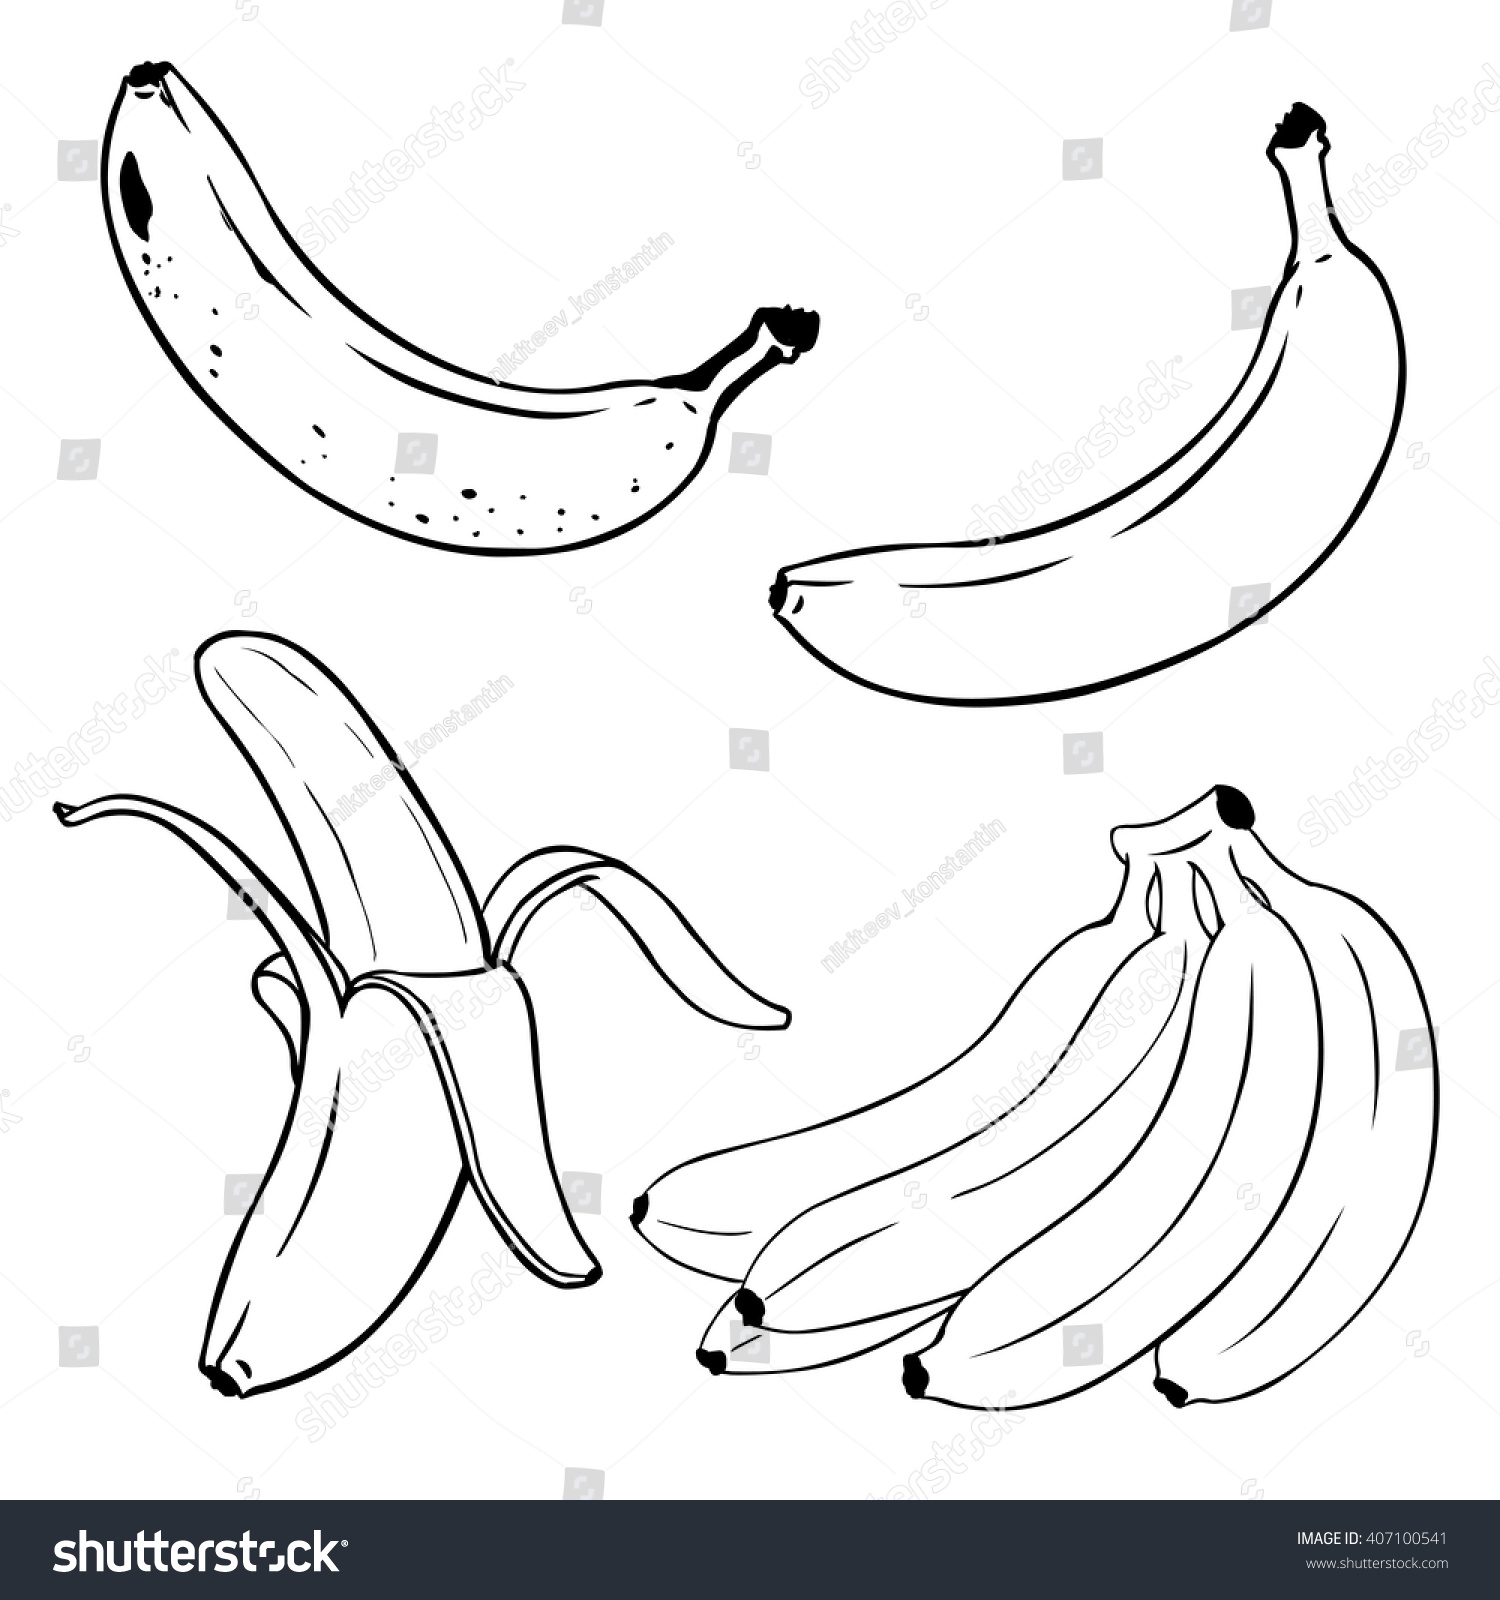 Line Drawing Banana : Vector set lineart bananas overripe banana stock